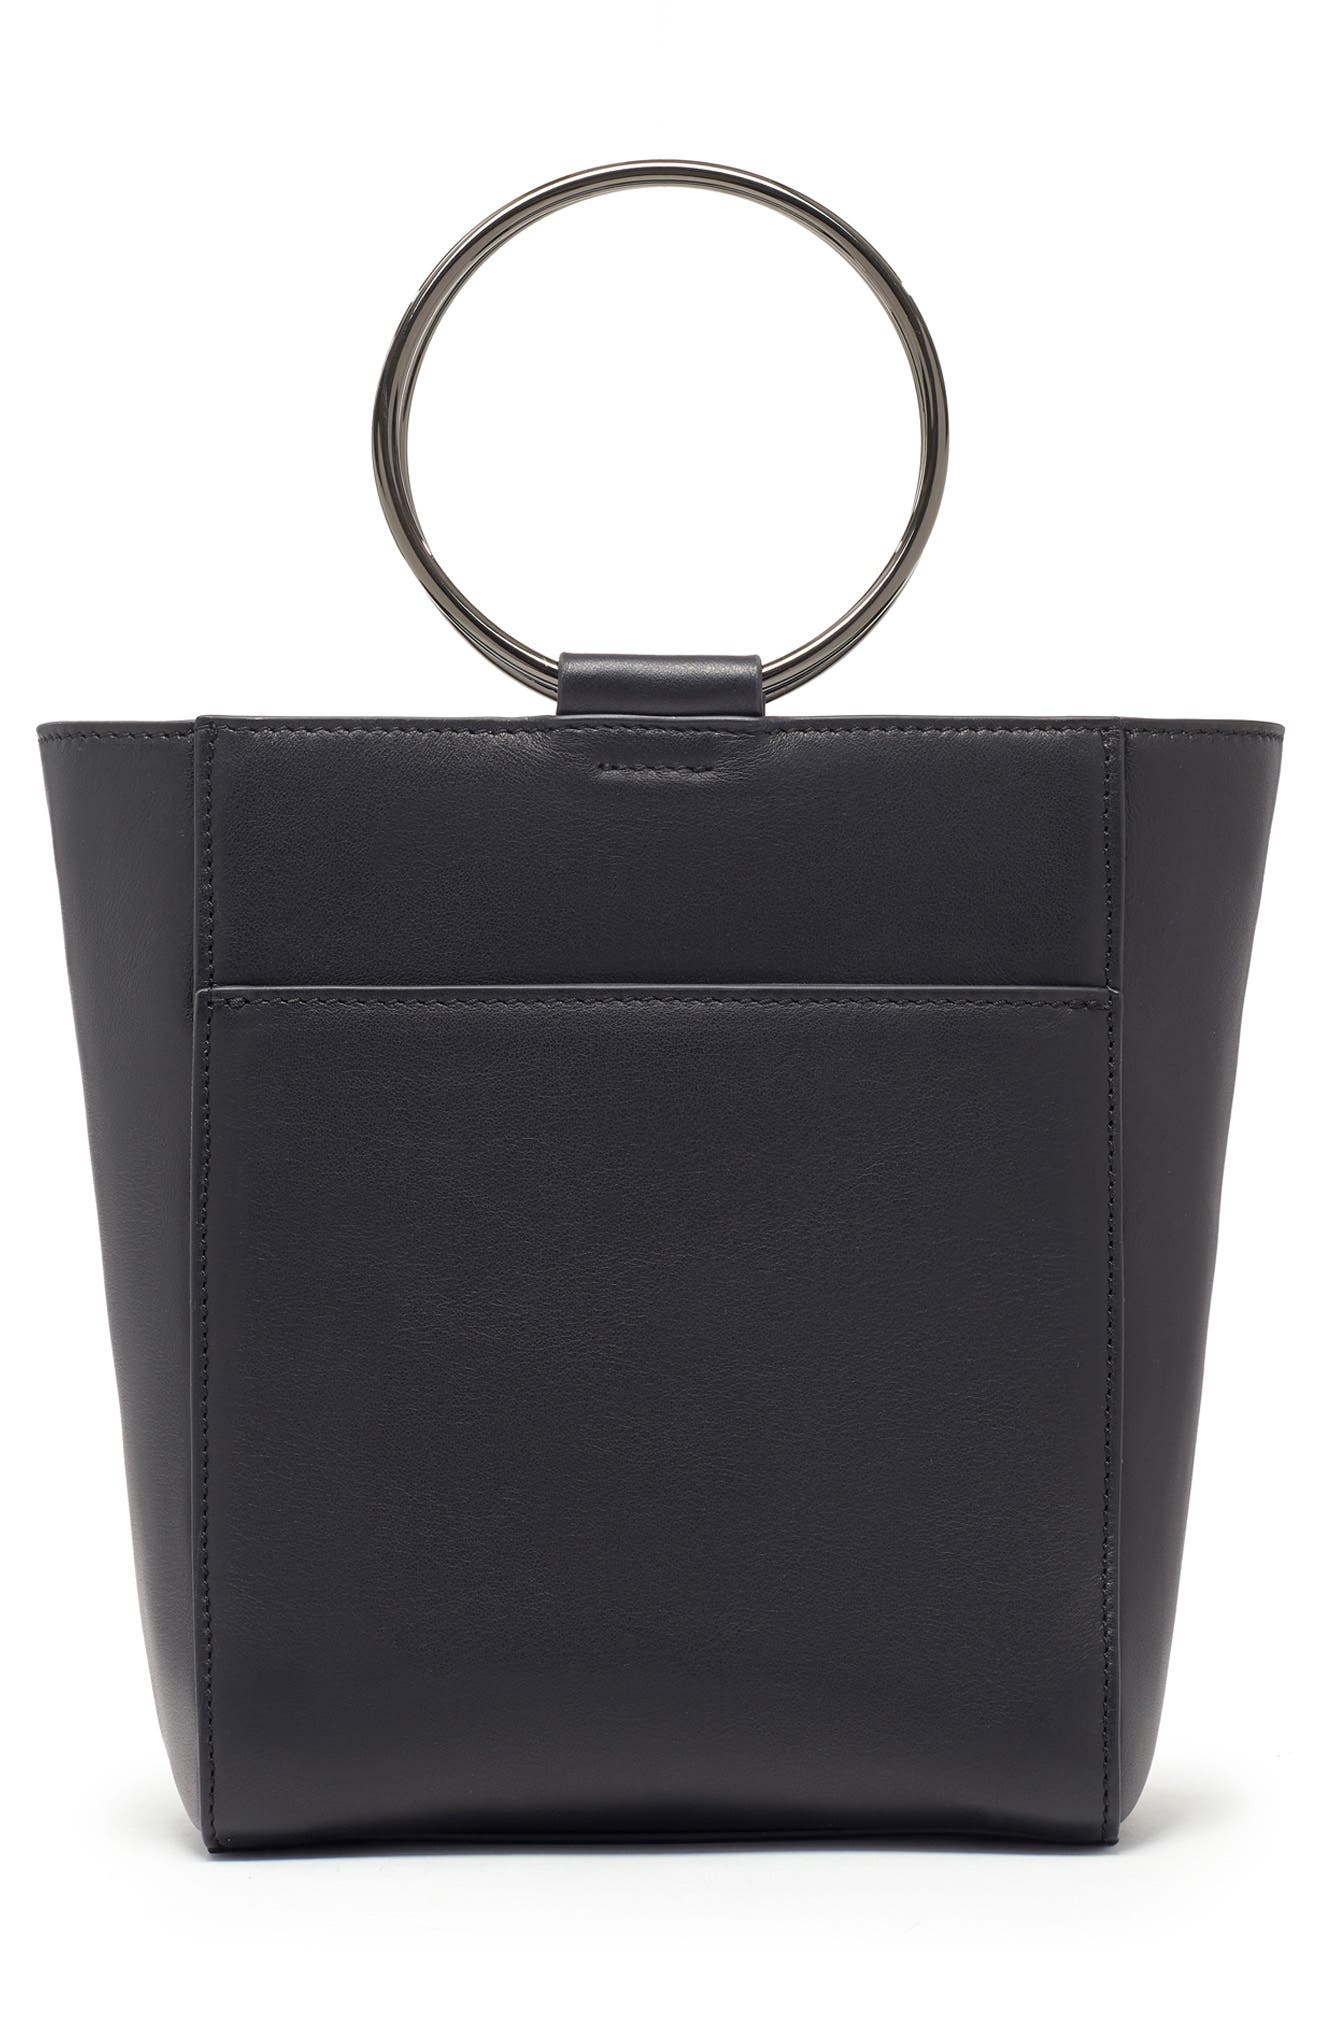 THACKER,                             Le Bucket Leather Bag,                             Alternate thumbnail 3, color,                             BLACK/ GUNMETAL